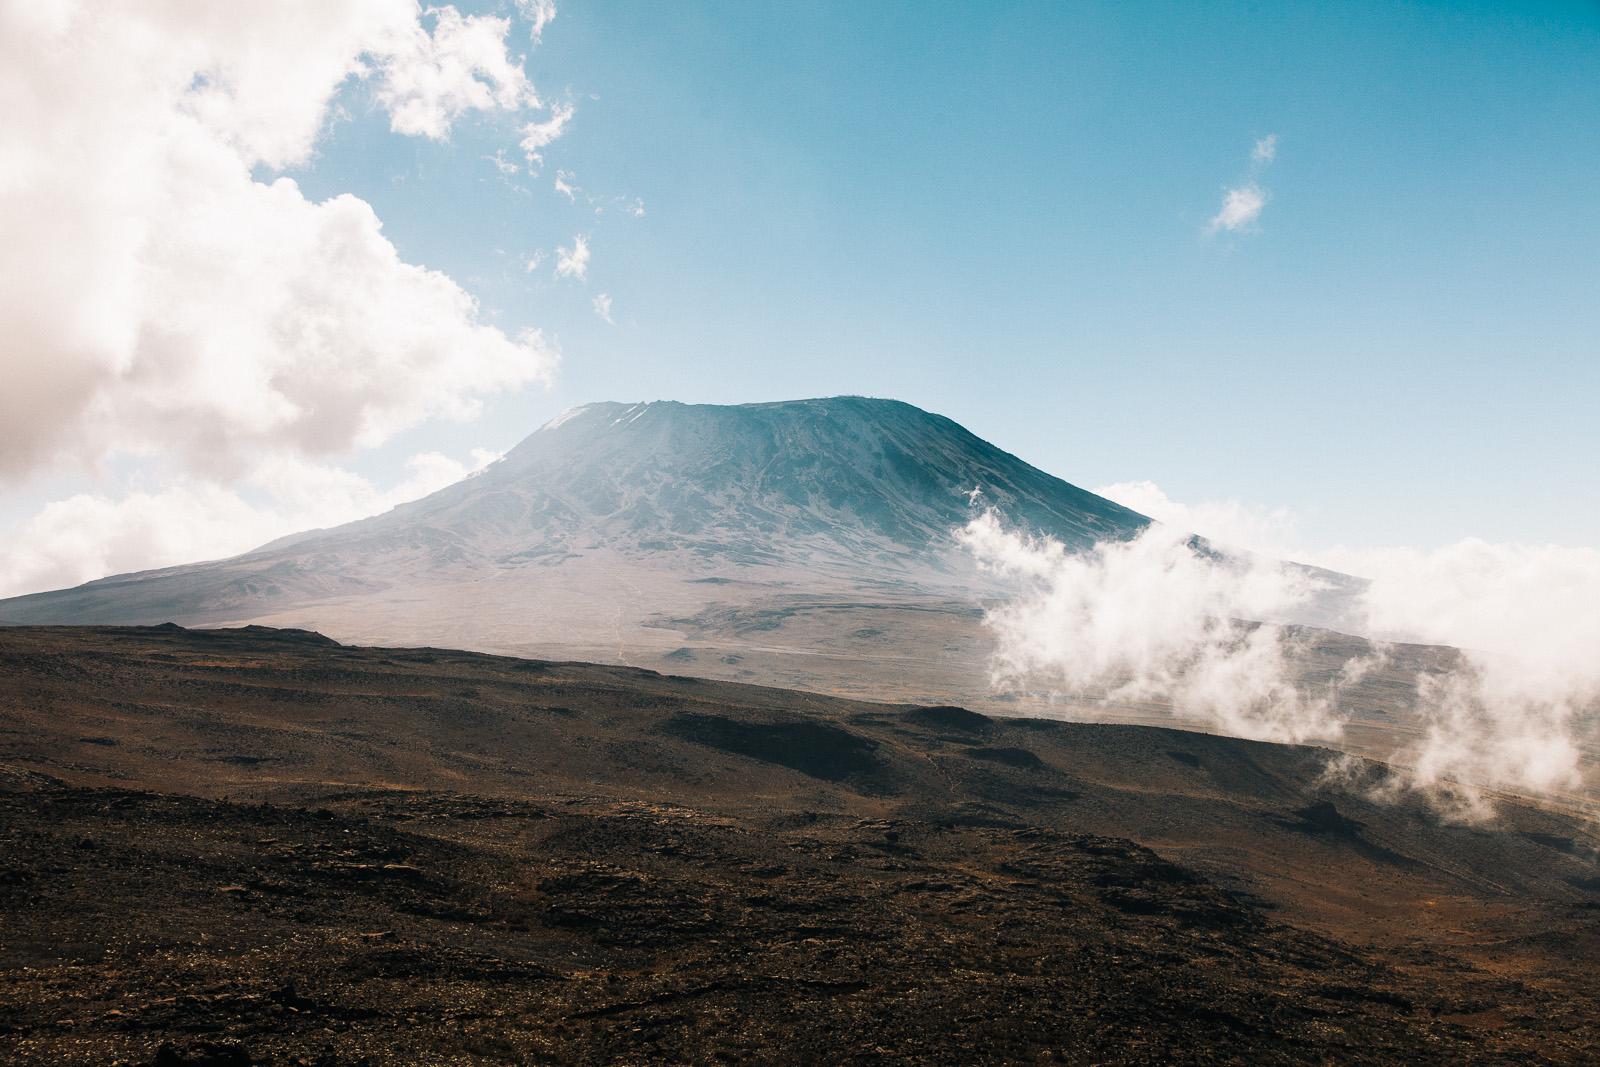 mount-kilimanjaro-kibo